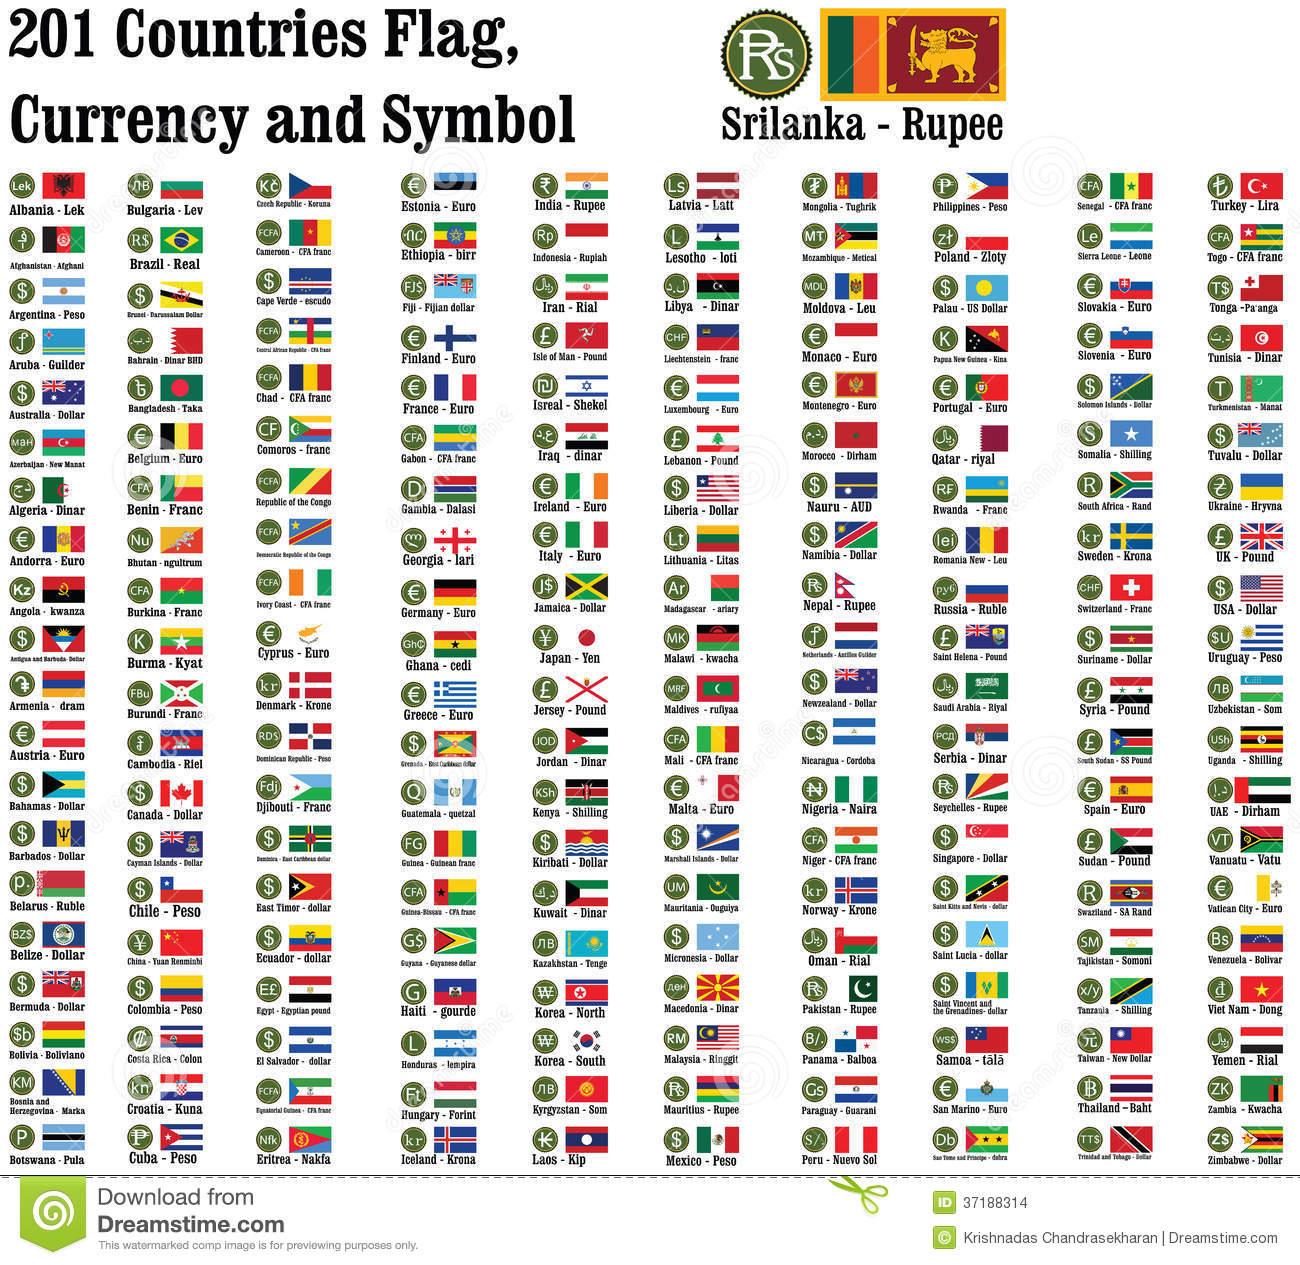 https://empoweryourknowledgeandhappytrivia.files.wordpress.com/2014/12/201-countries-flags-currencies-symbols.jpg